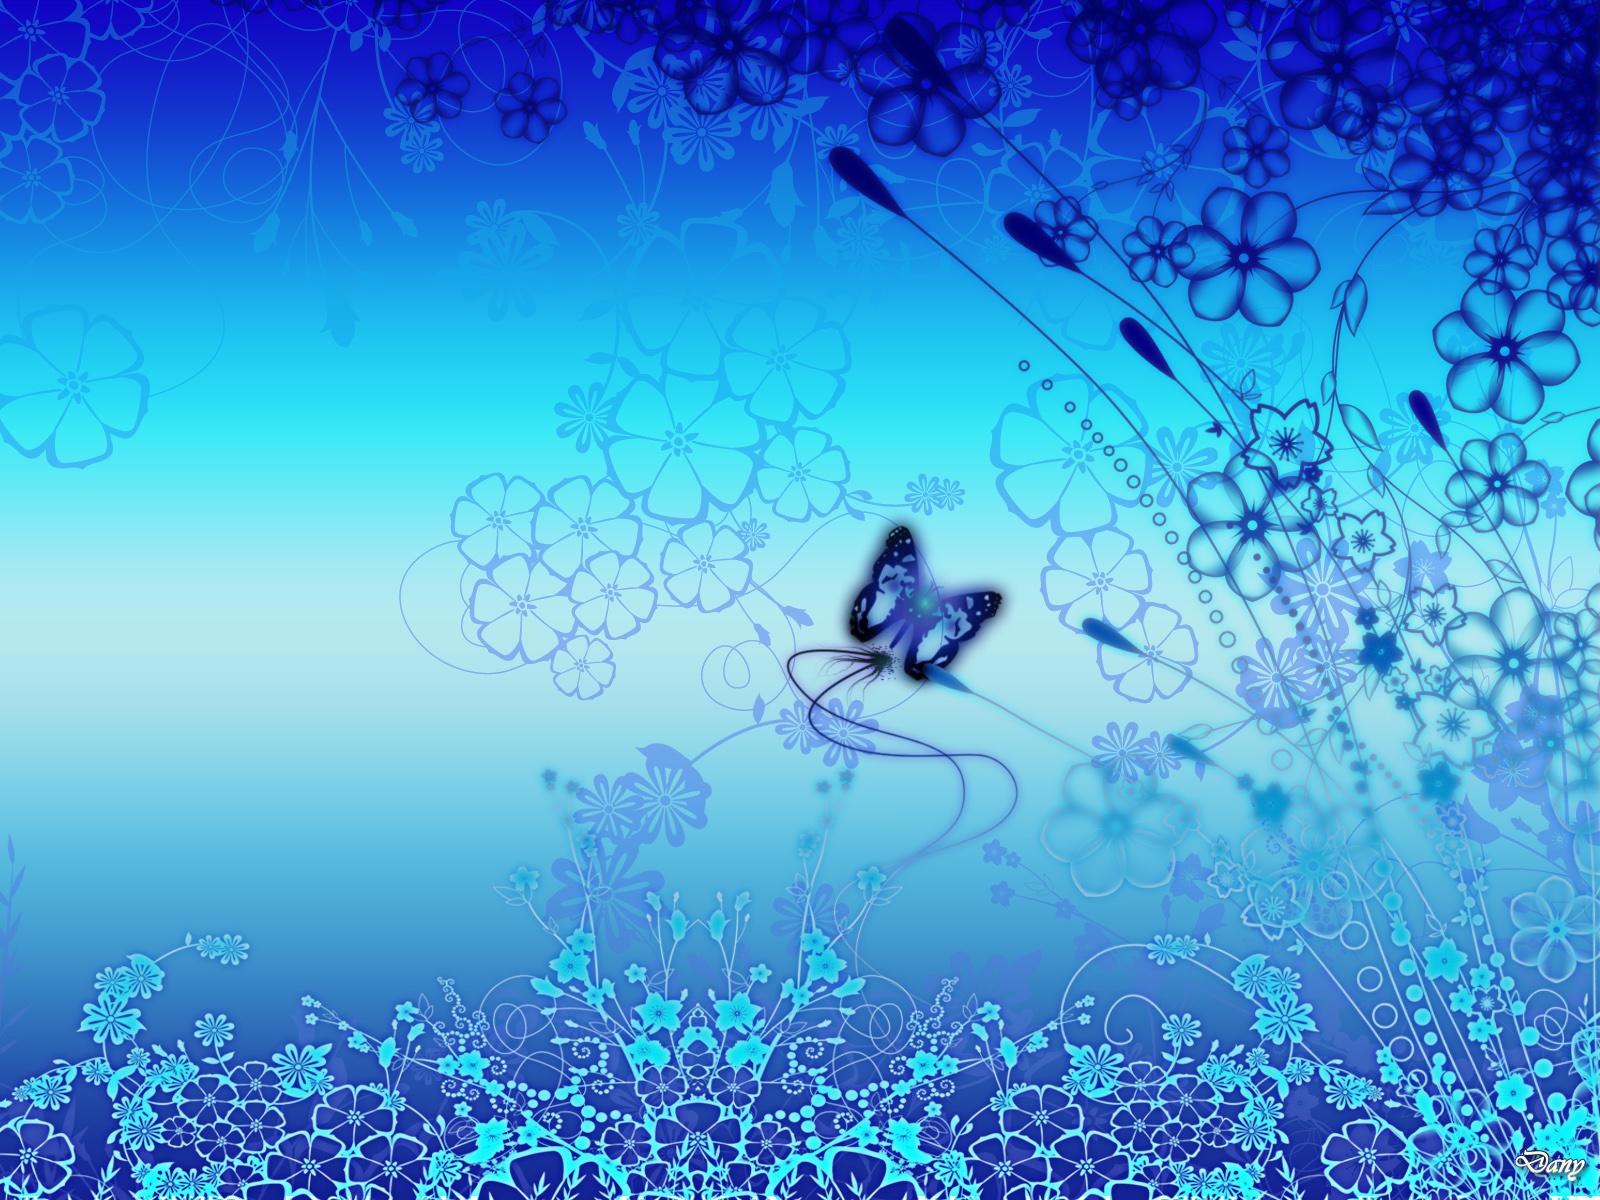 Floral Blue desktop wallpaper 1600x1200